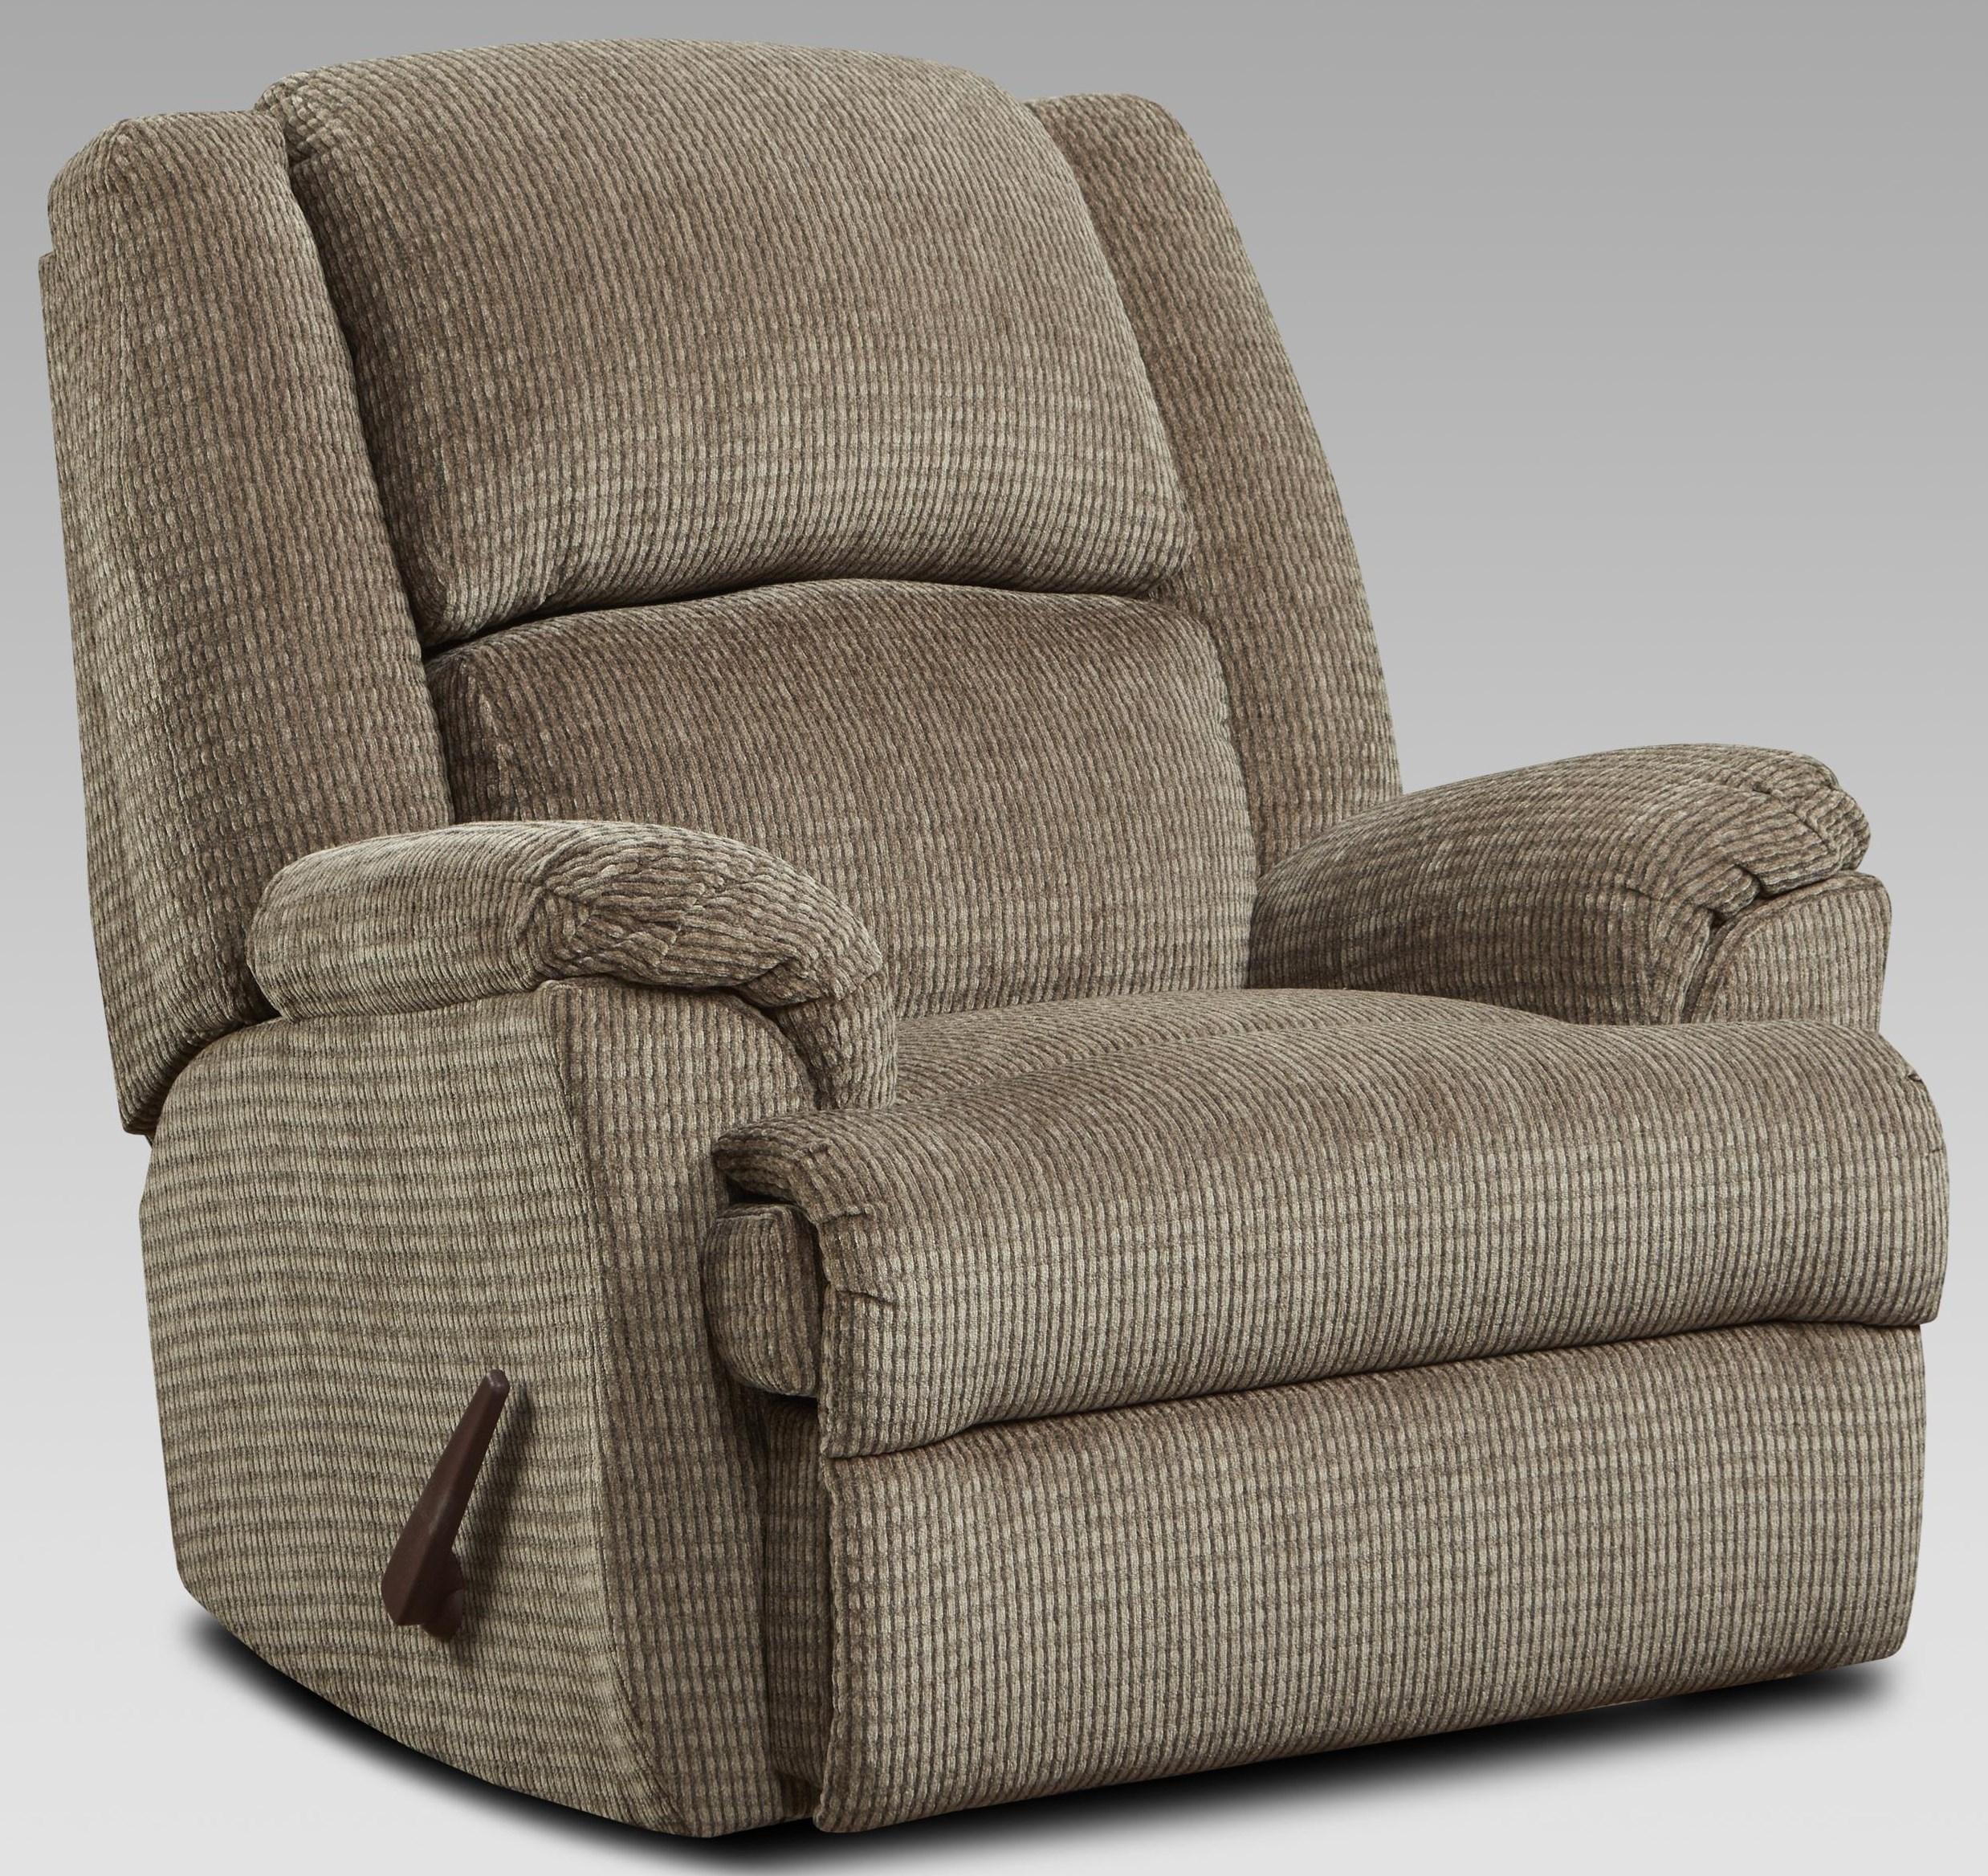 2600 2600 MOCHA RECLINER by Affordable Furniture at Furniture Fair - North Carolina